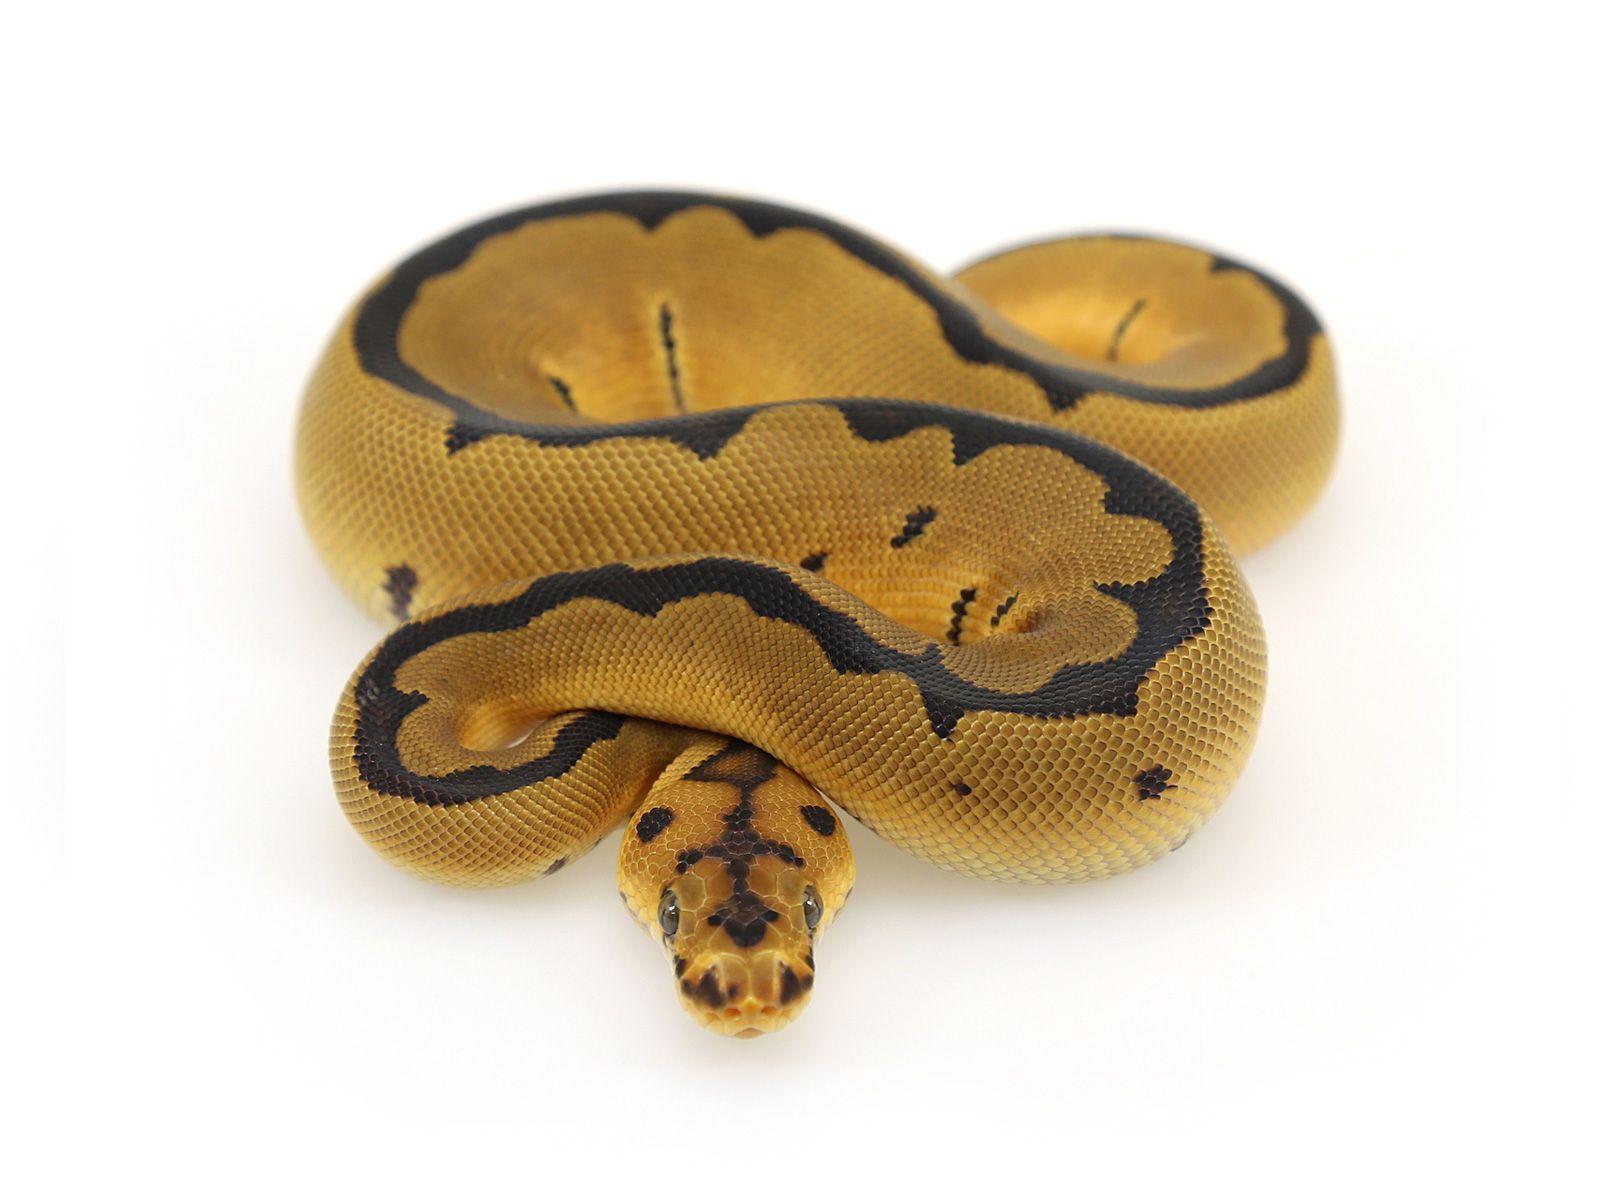 Ball Python Super Blade Orange Dream Clown Snakes Ball Python